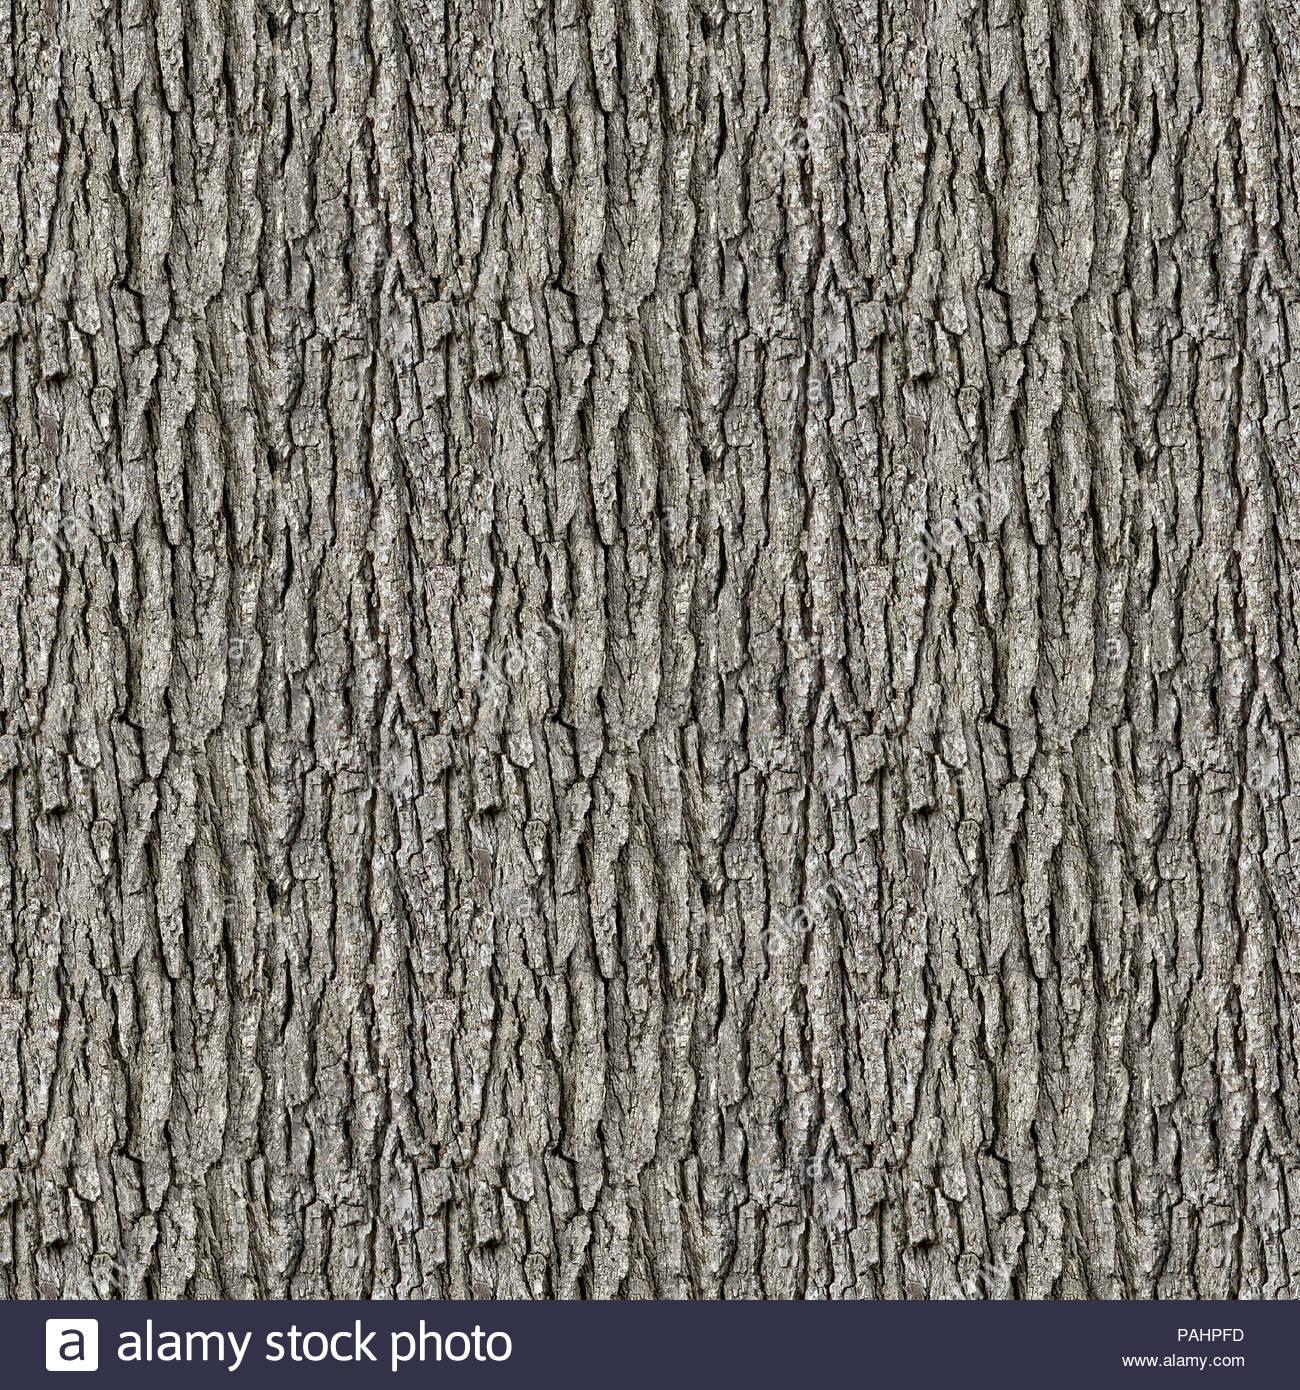 seamless tileable tree bark texture background stock photo